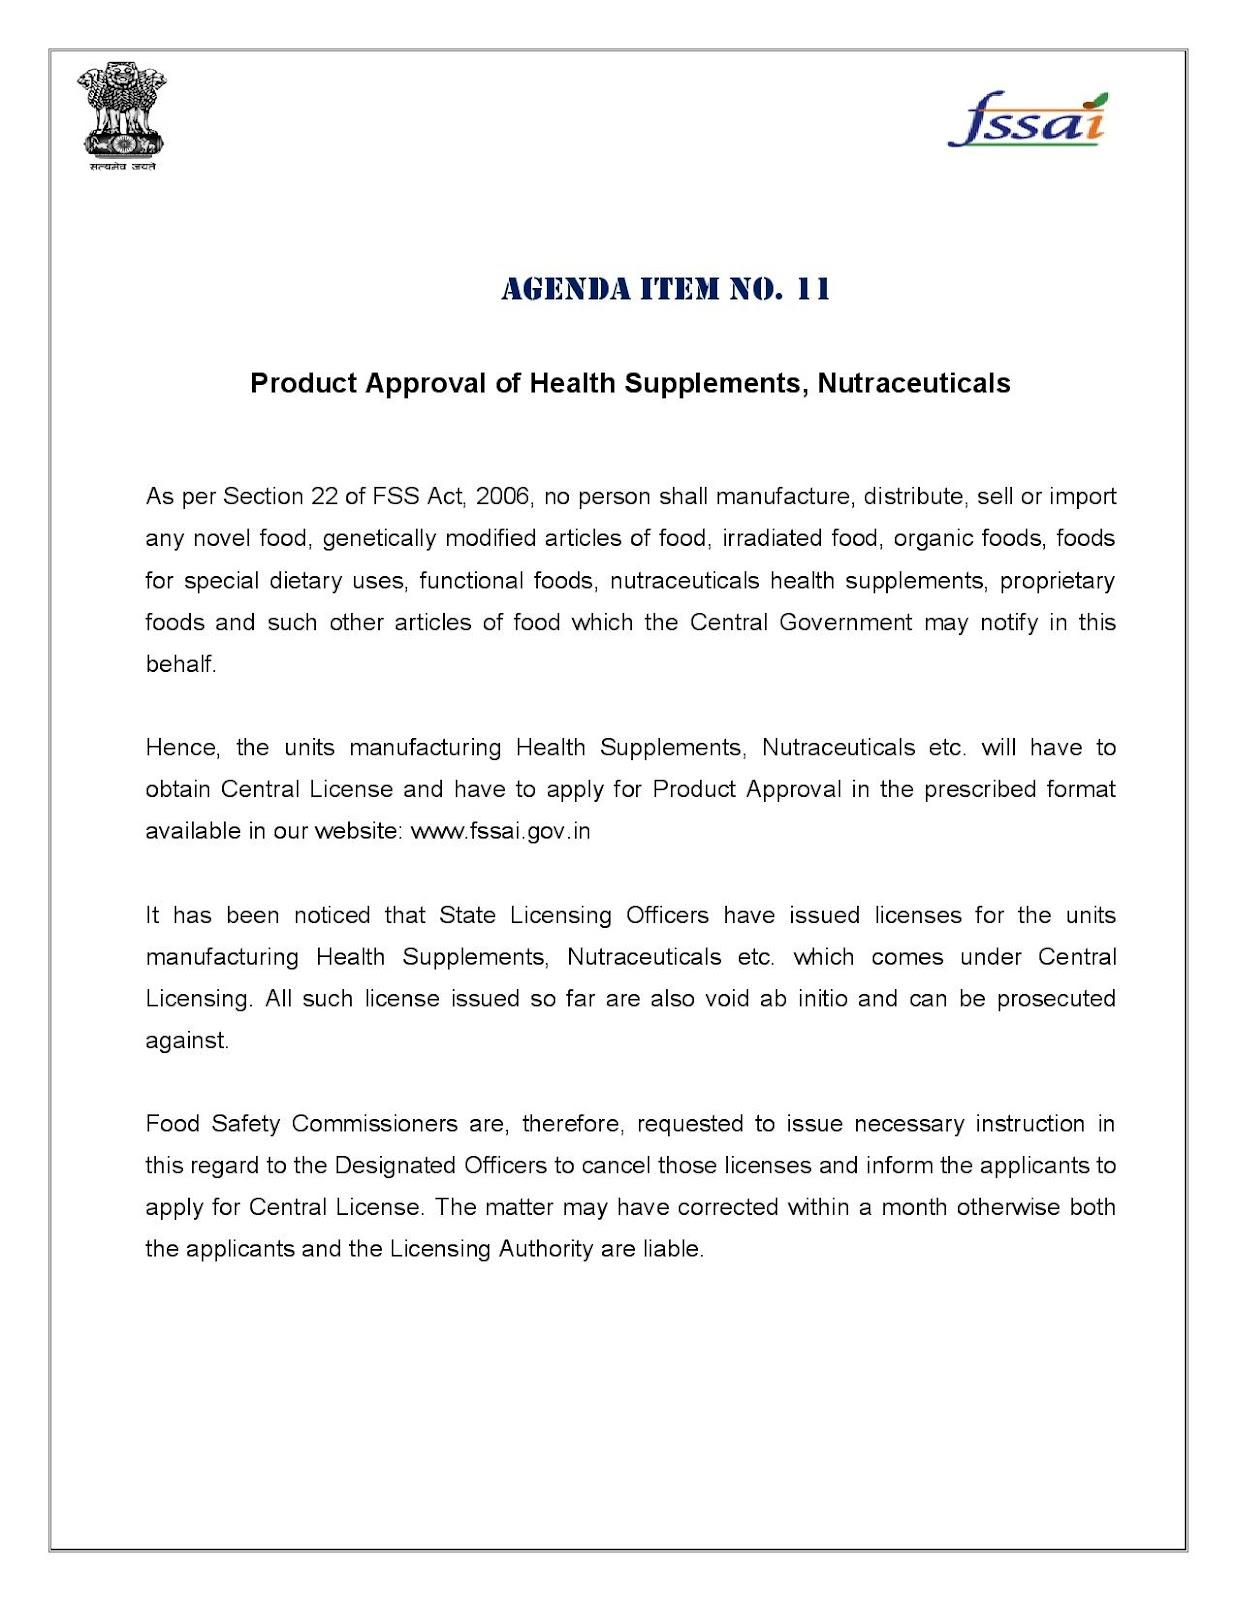 FOOD SAFETY LATEST: Jul 6, 2012